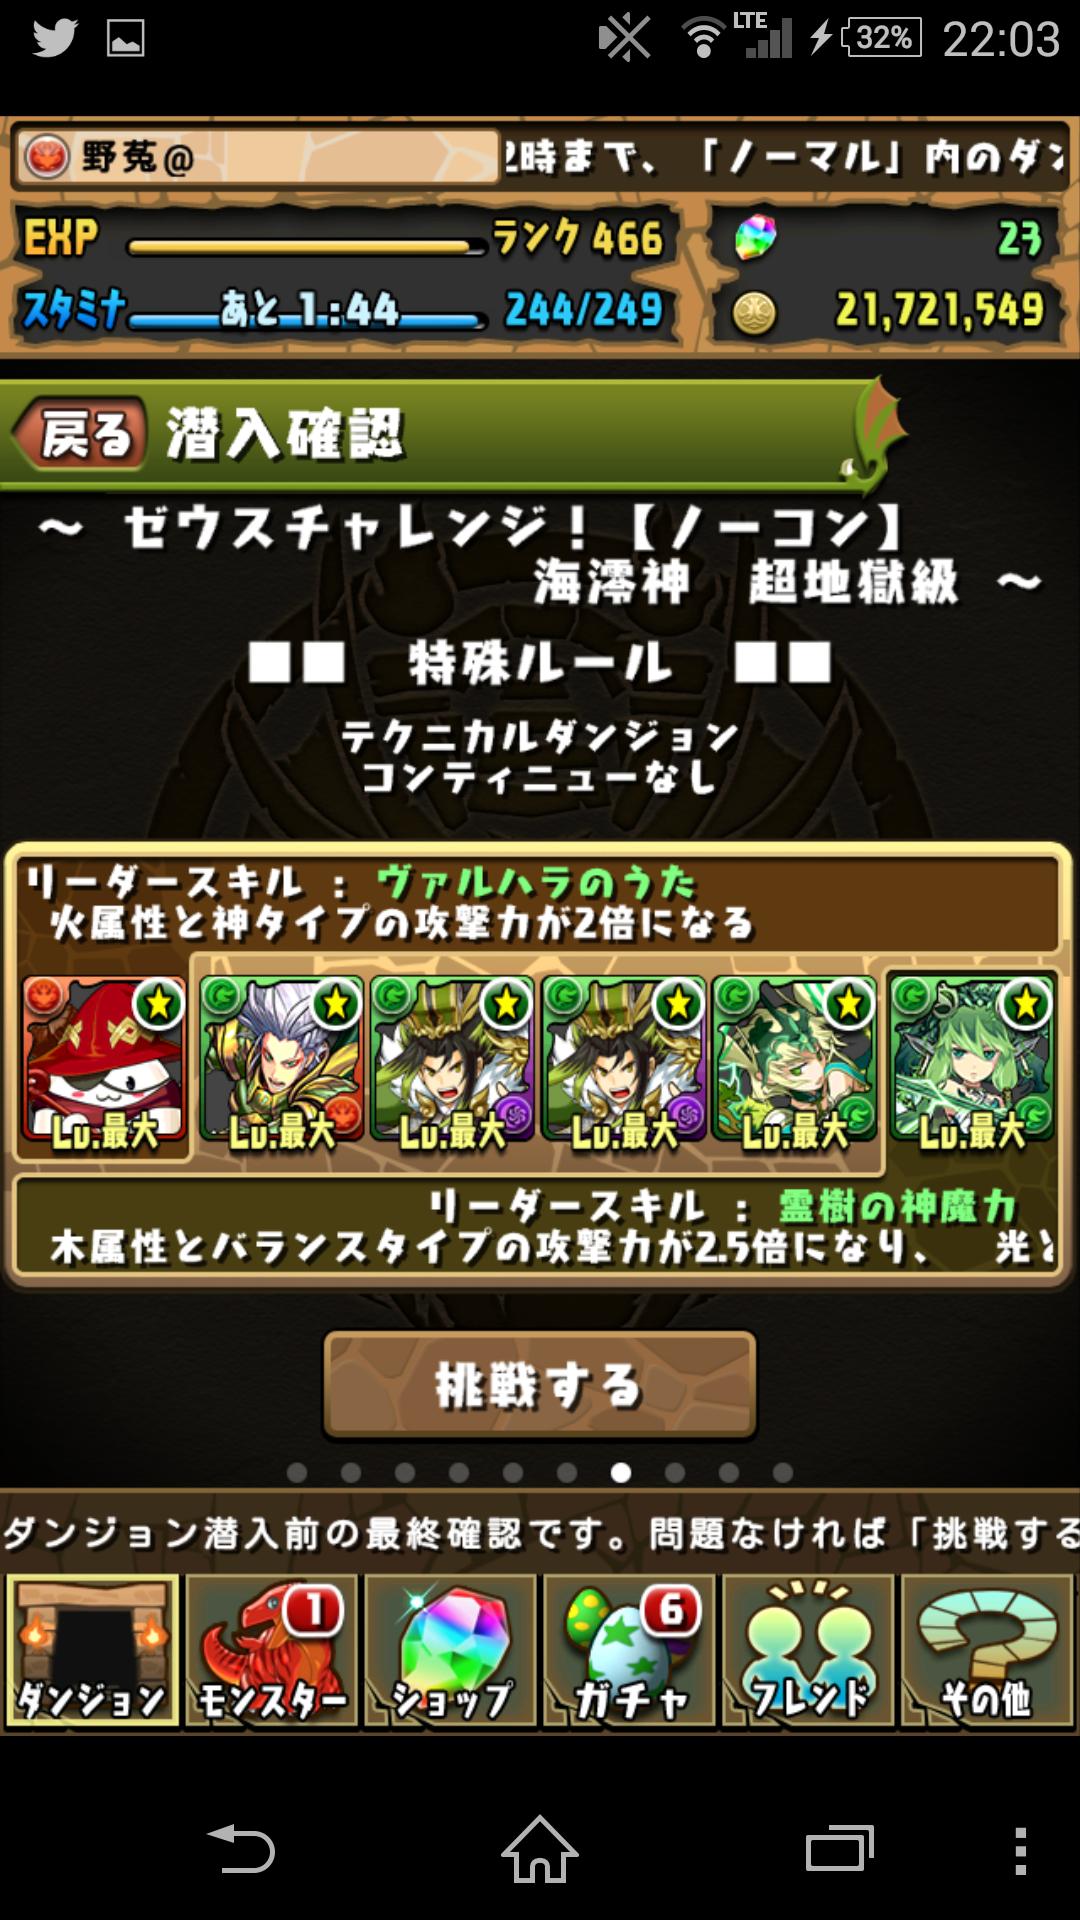 Screenshot_2015-02-20-22-03-54.png